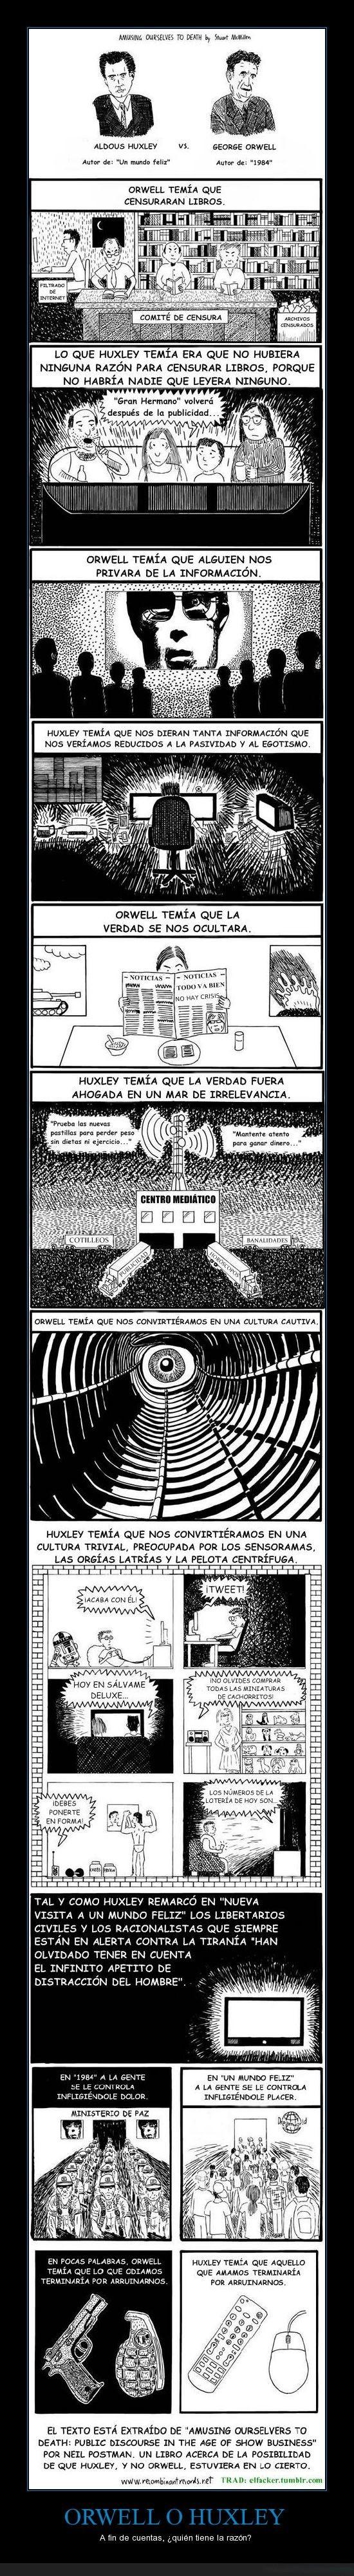 chipalienados-orwell-vs-huxley